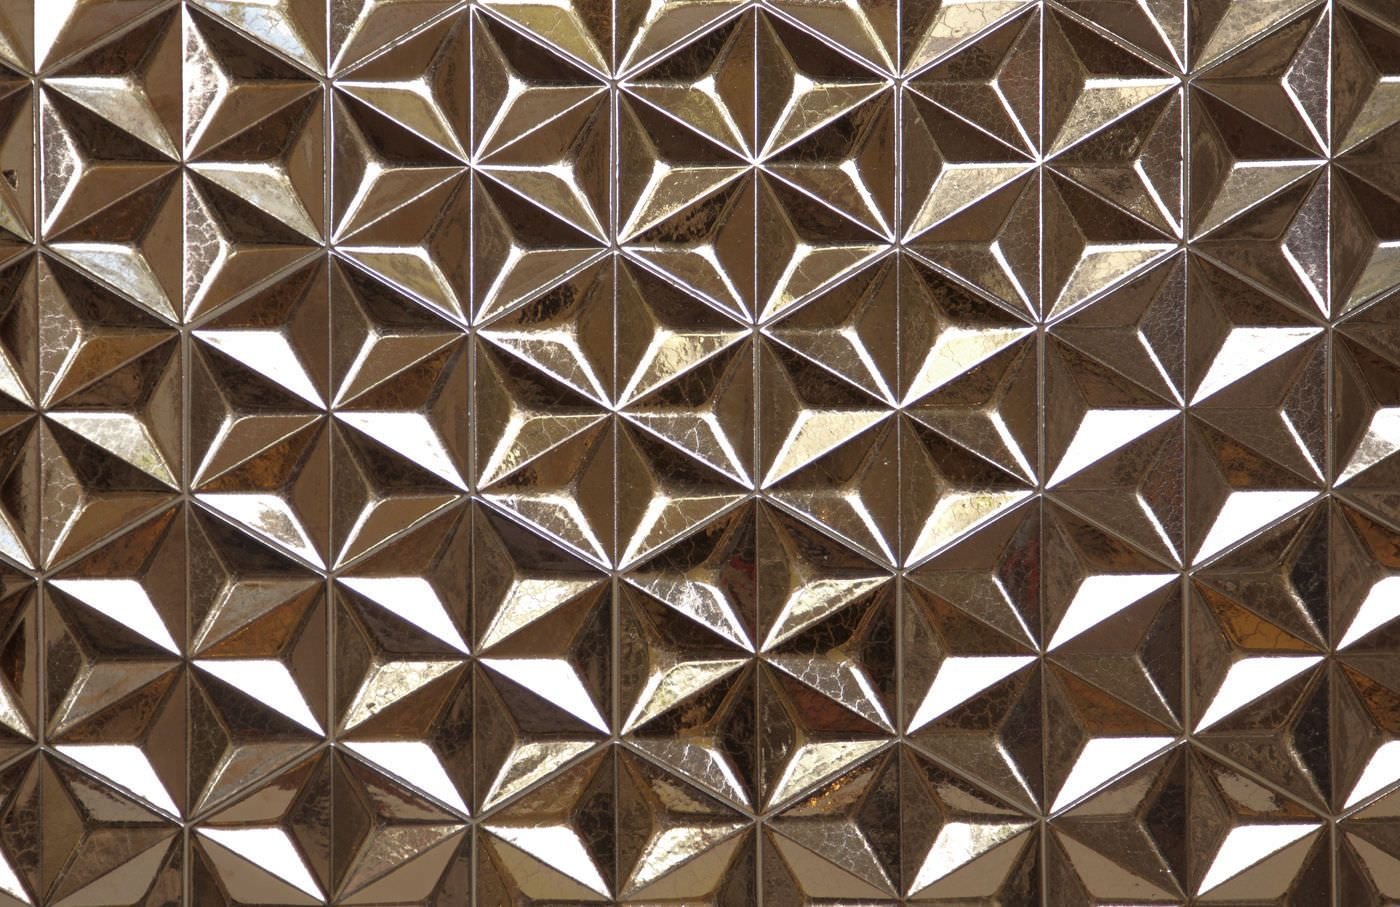 Japanese Geometric Patterns Google Search Ceramic Wall